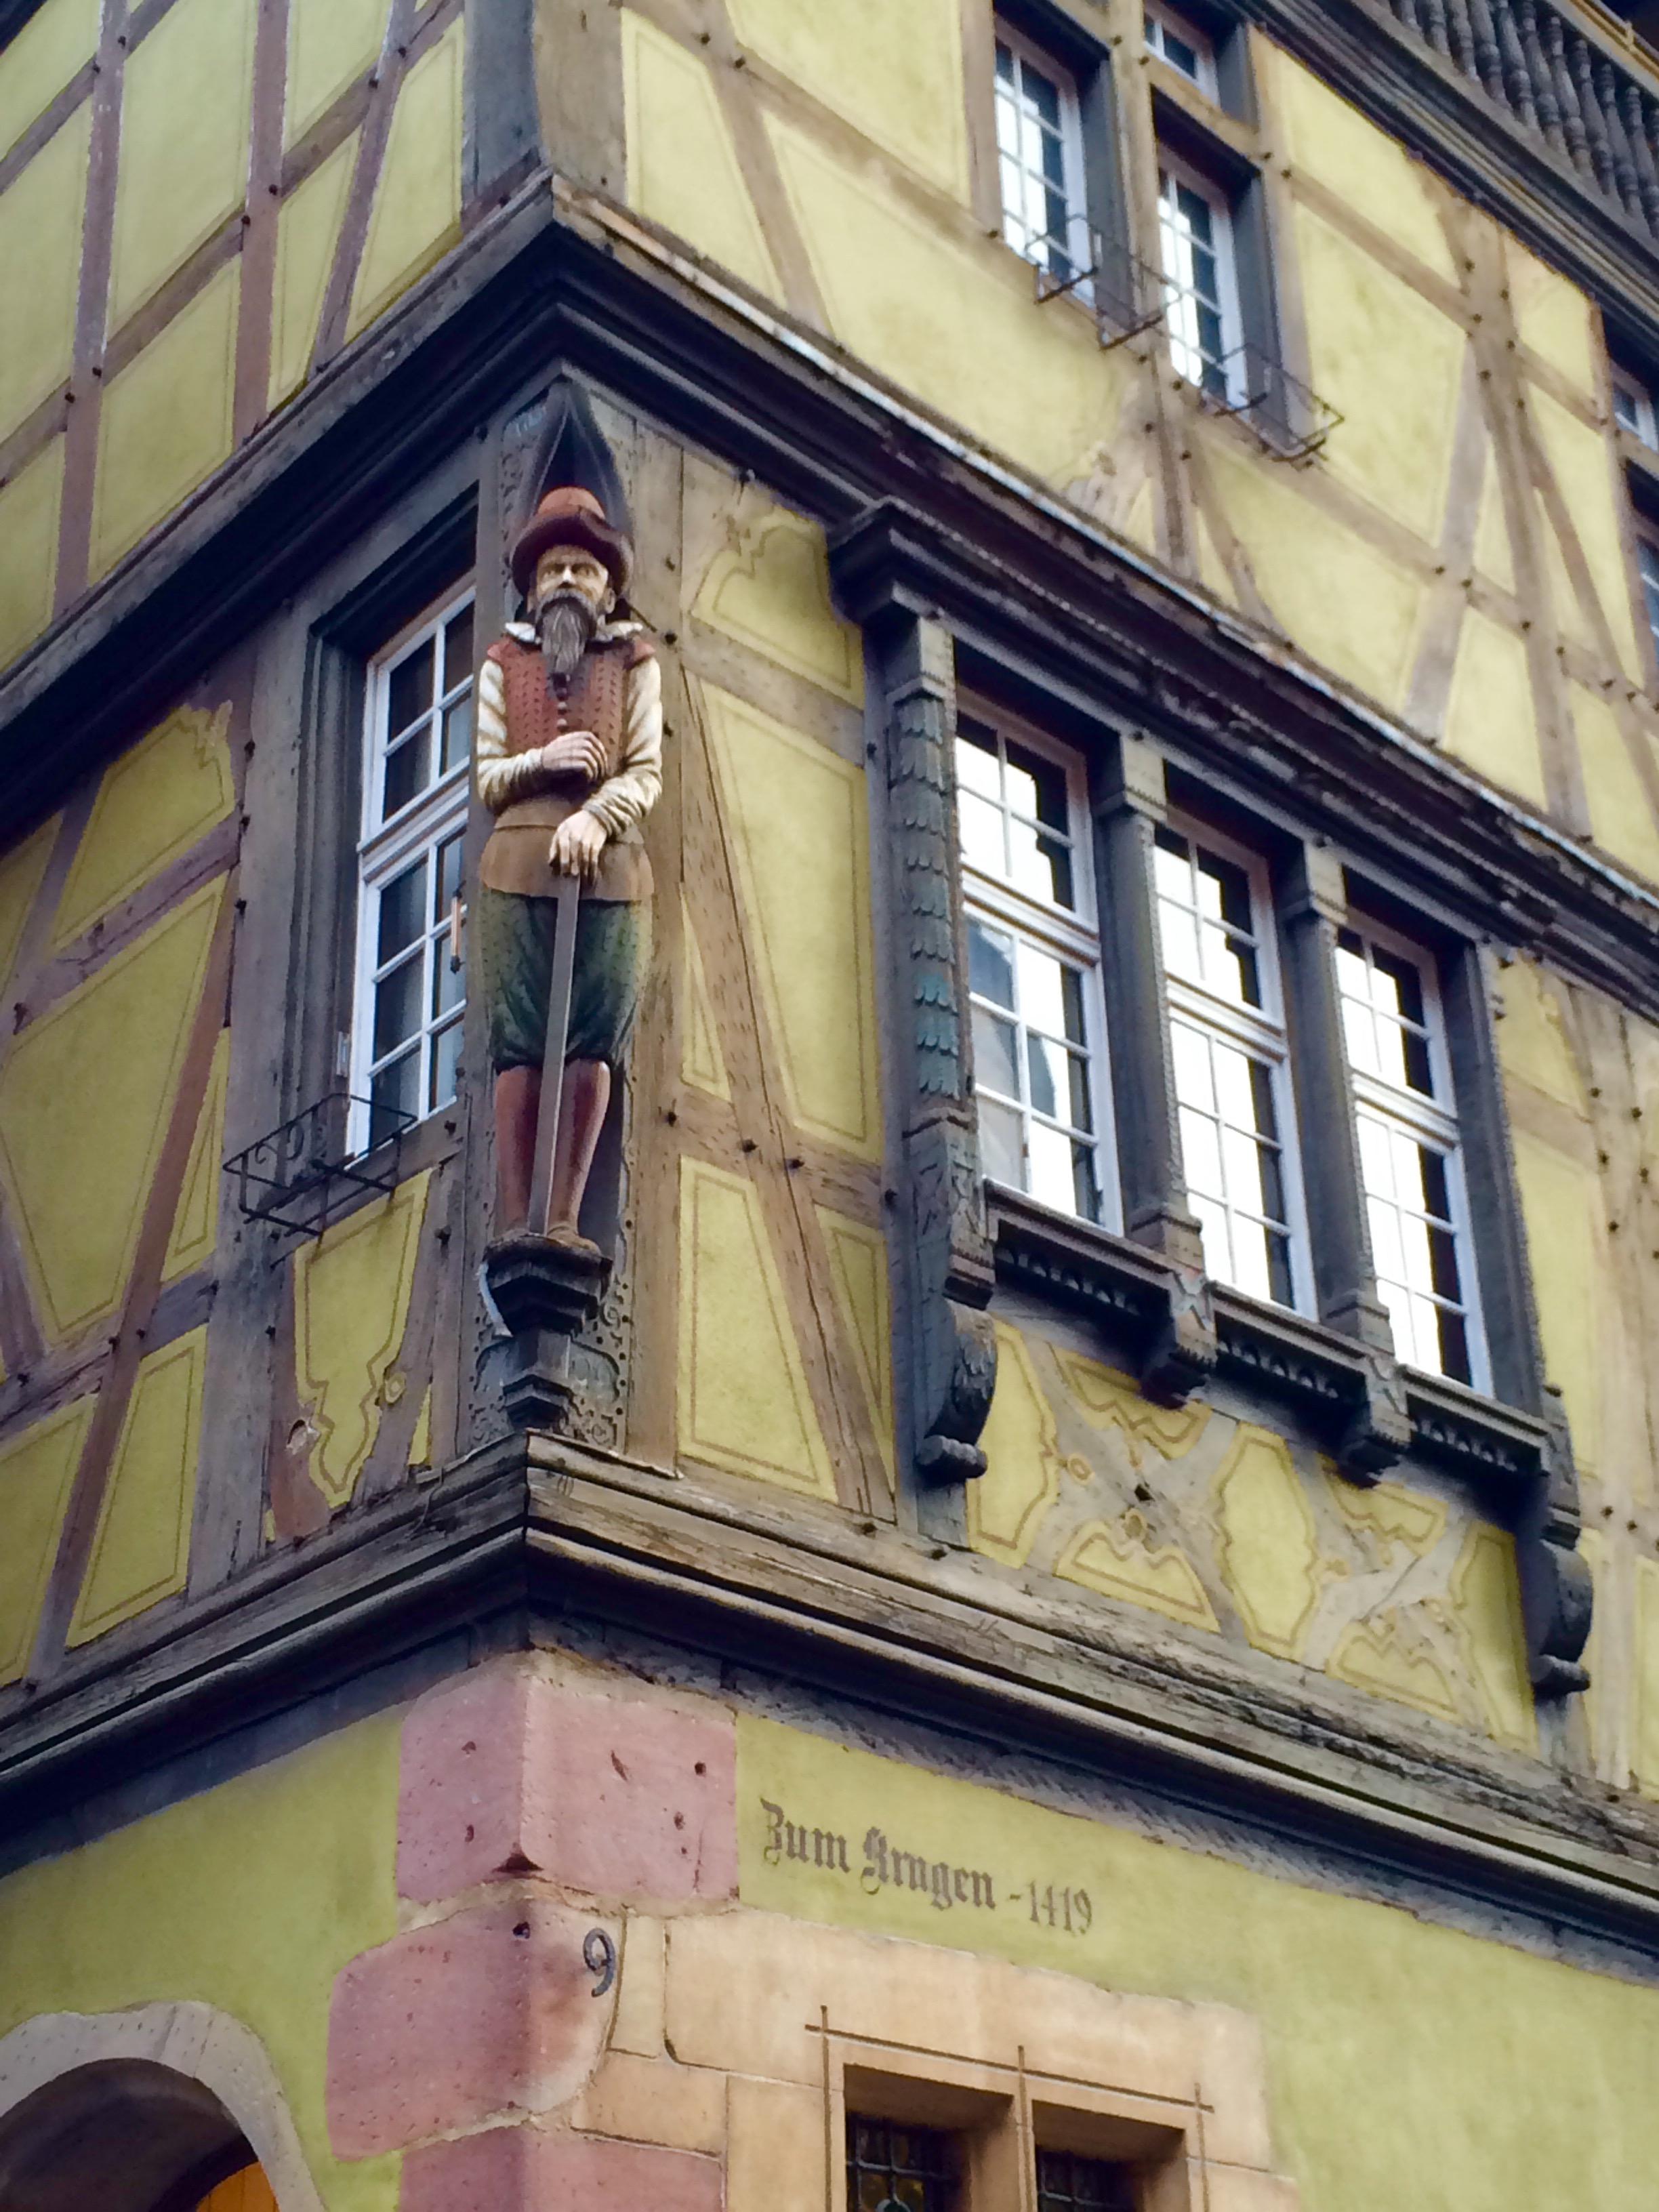 15th Century Building in Colmar, France